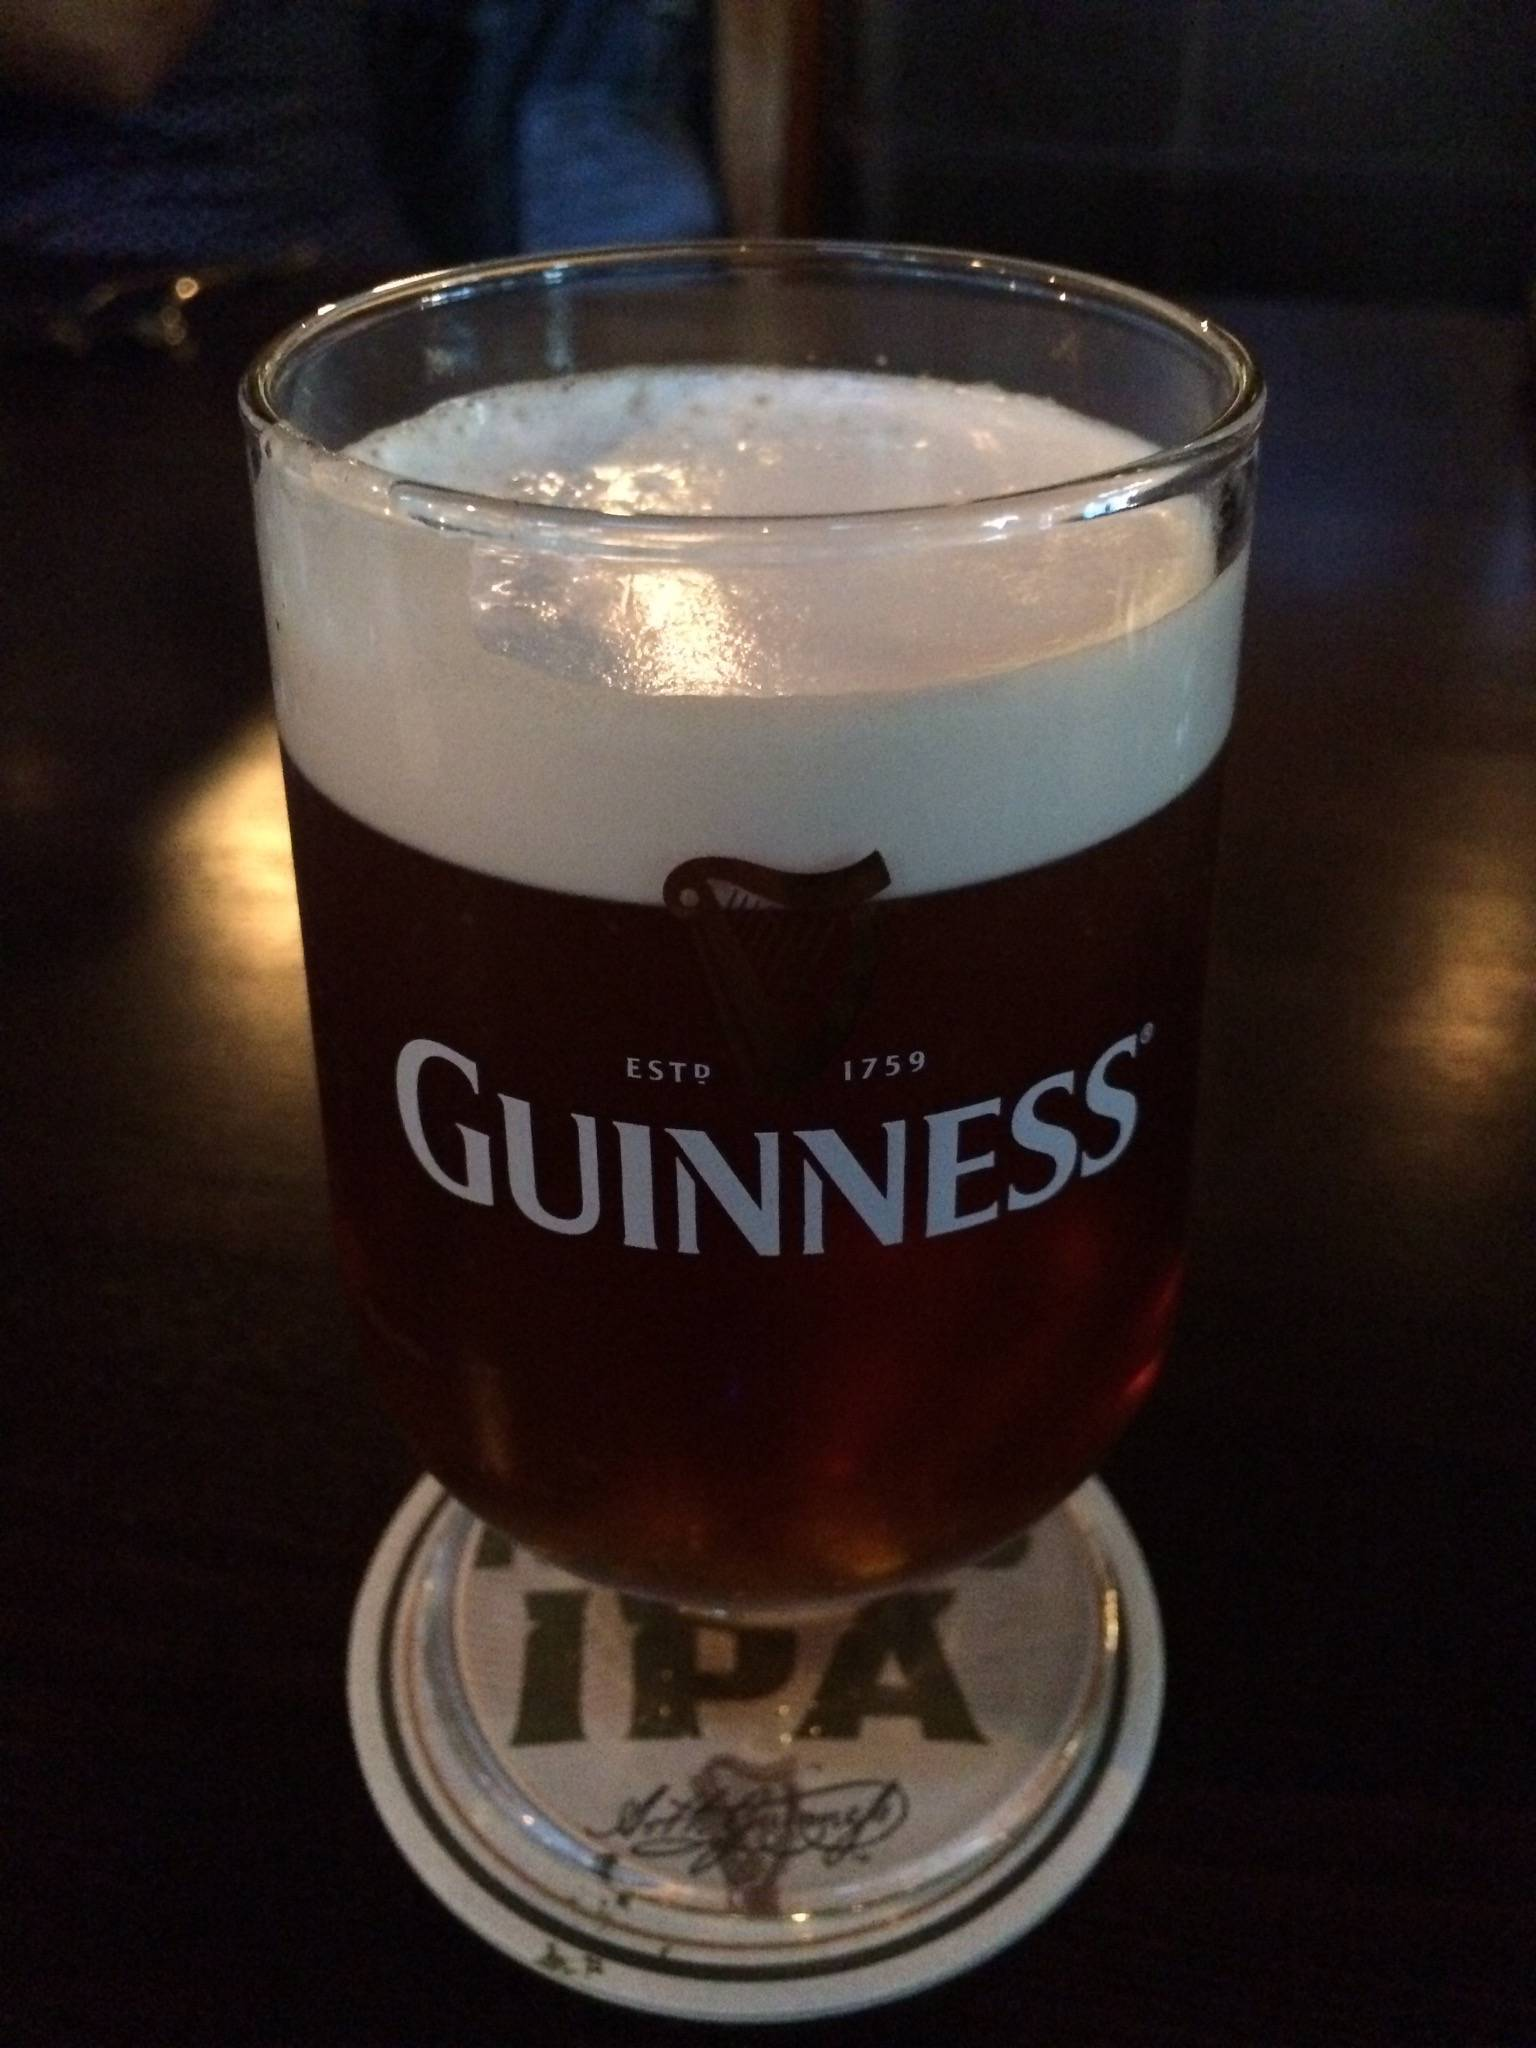 Обзор пива гиннес нитро ипа